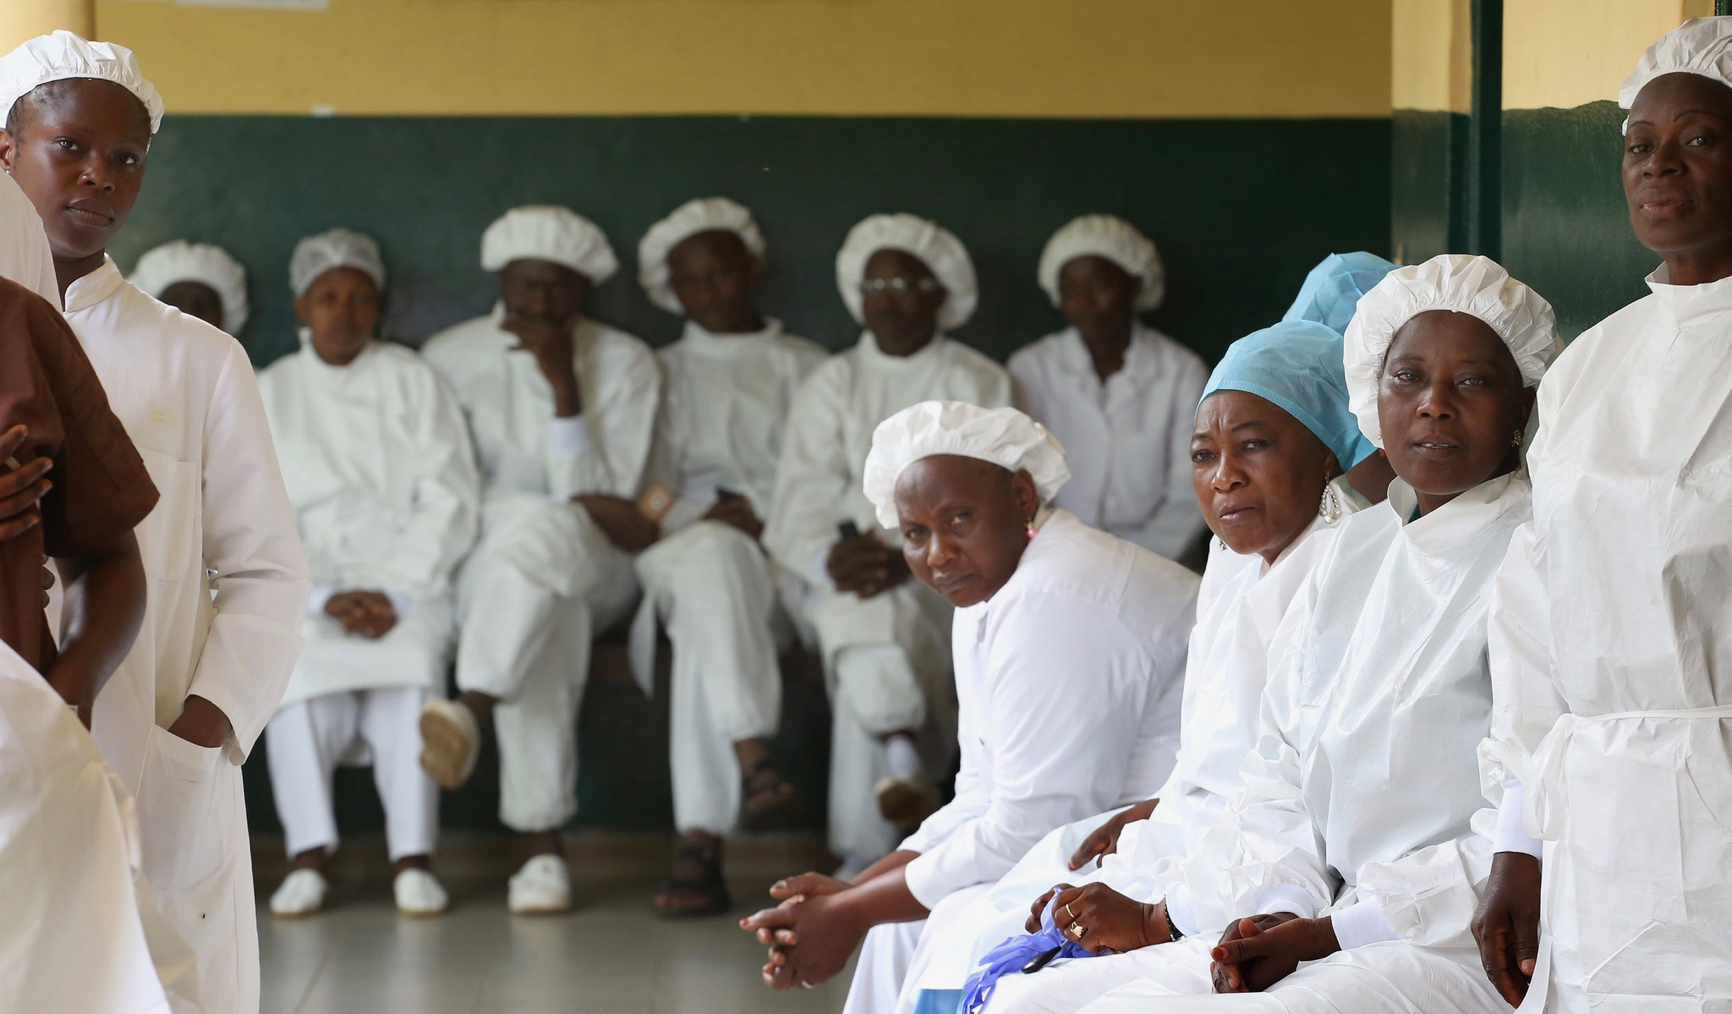 Nigeria's maternal healthcare crisis